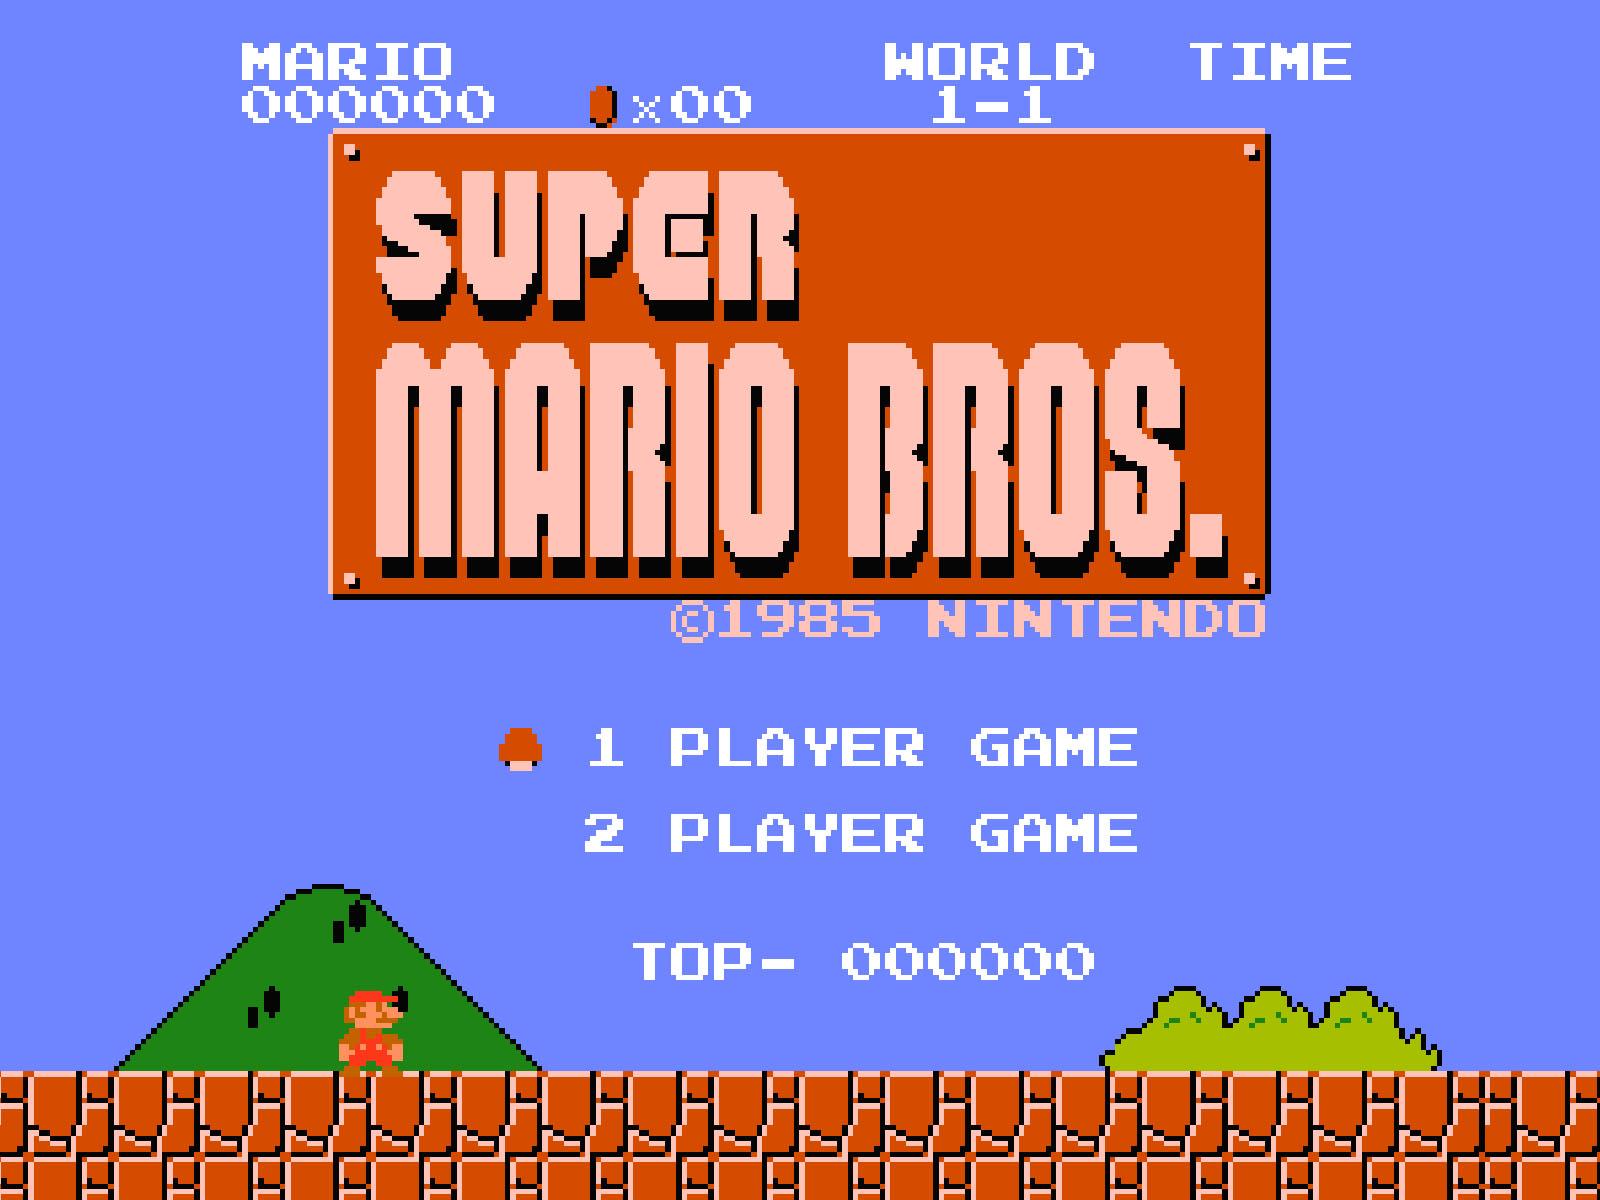 Super Mario Bros./Other